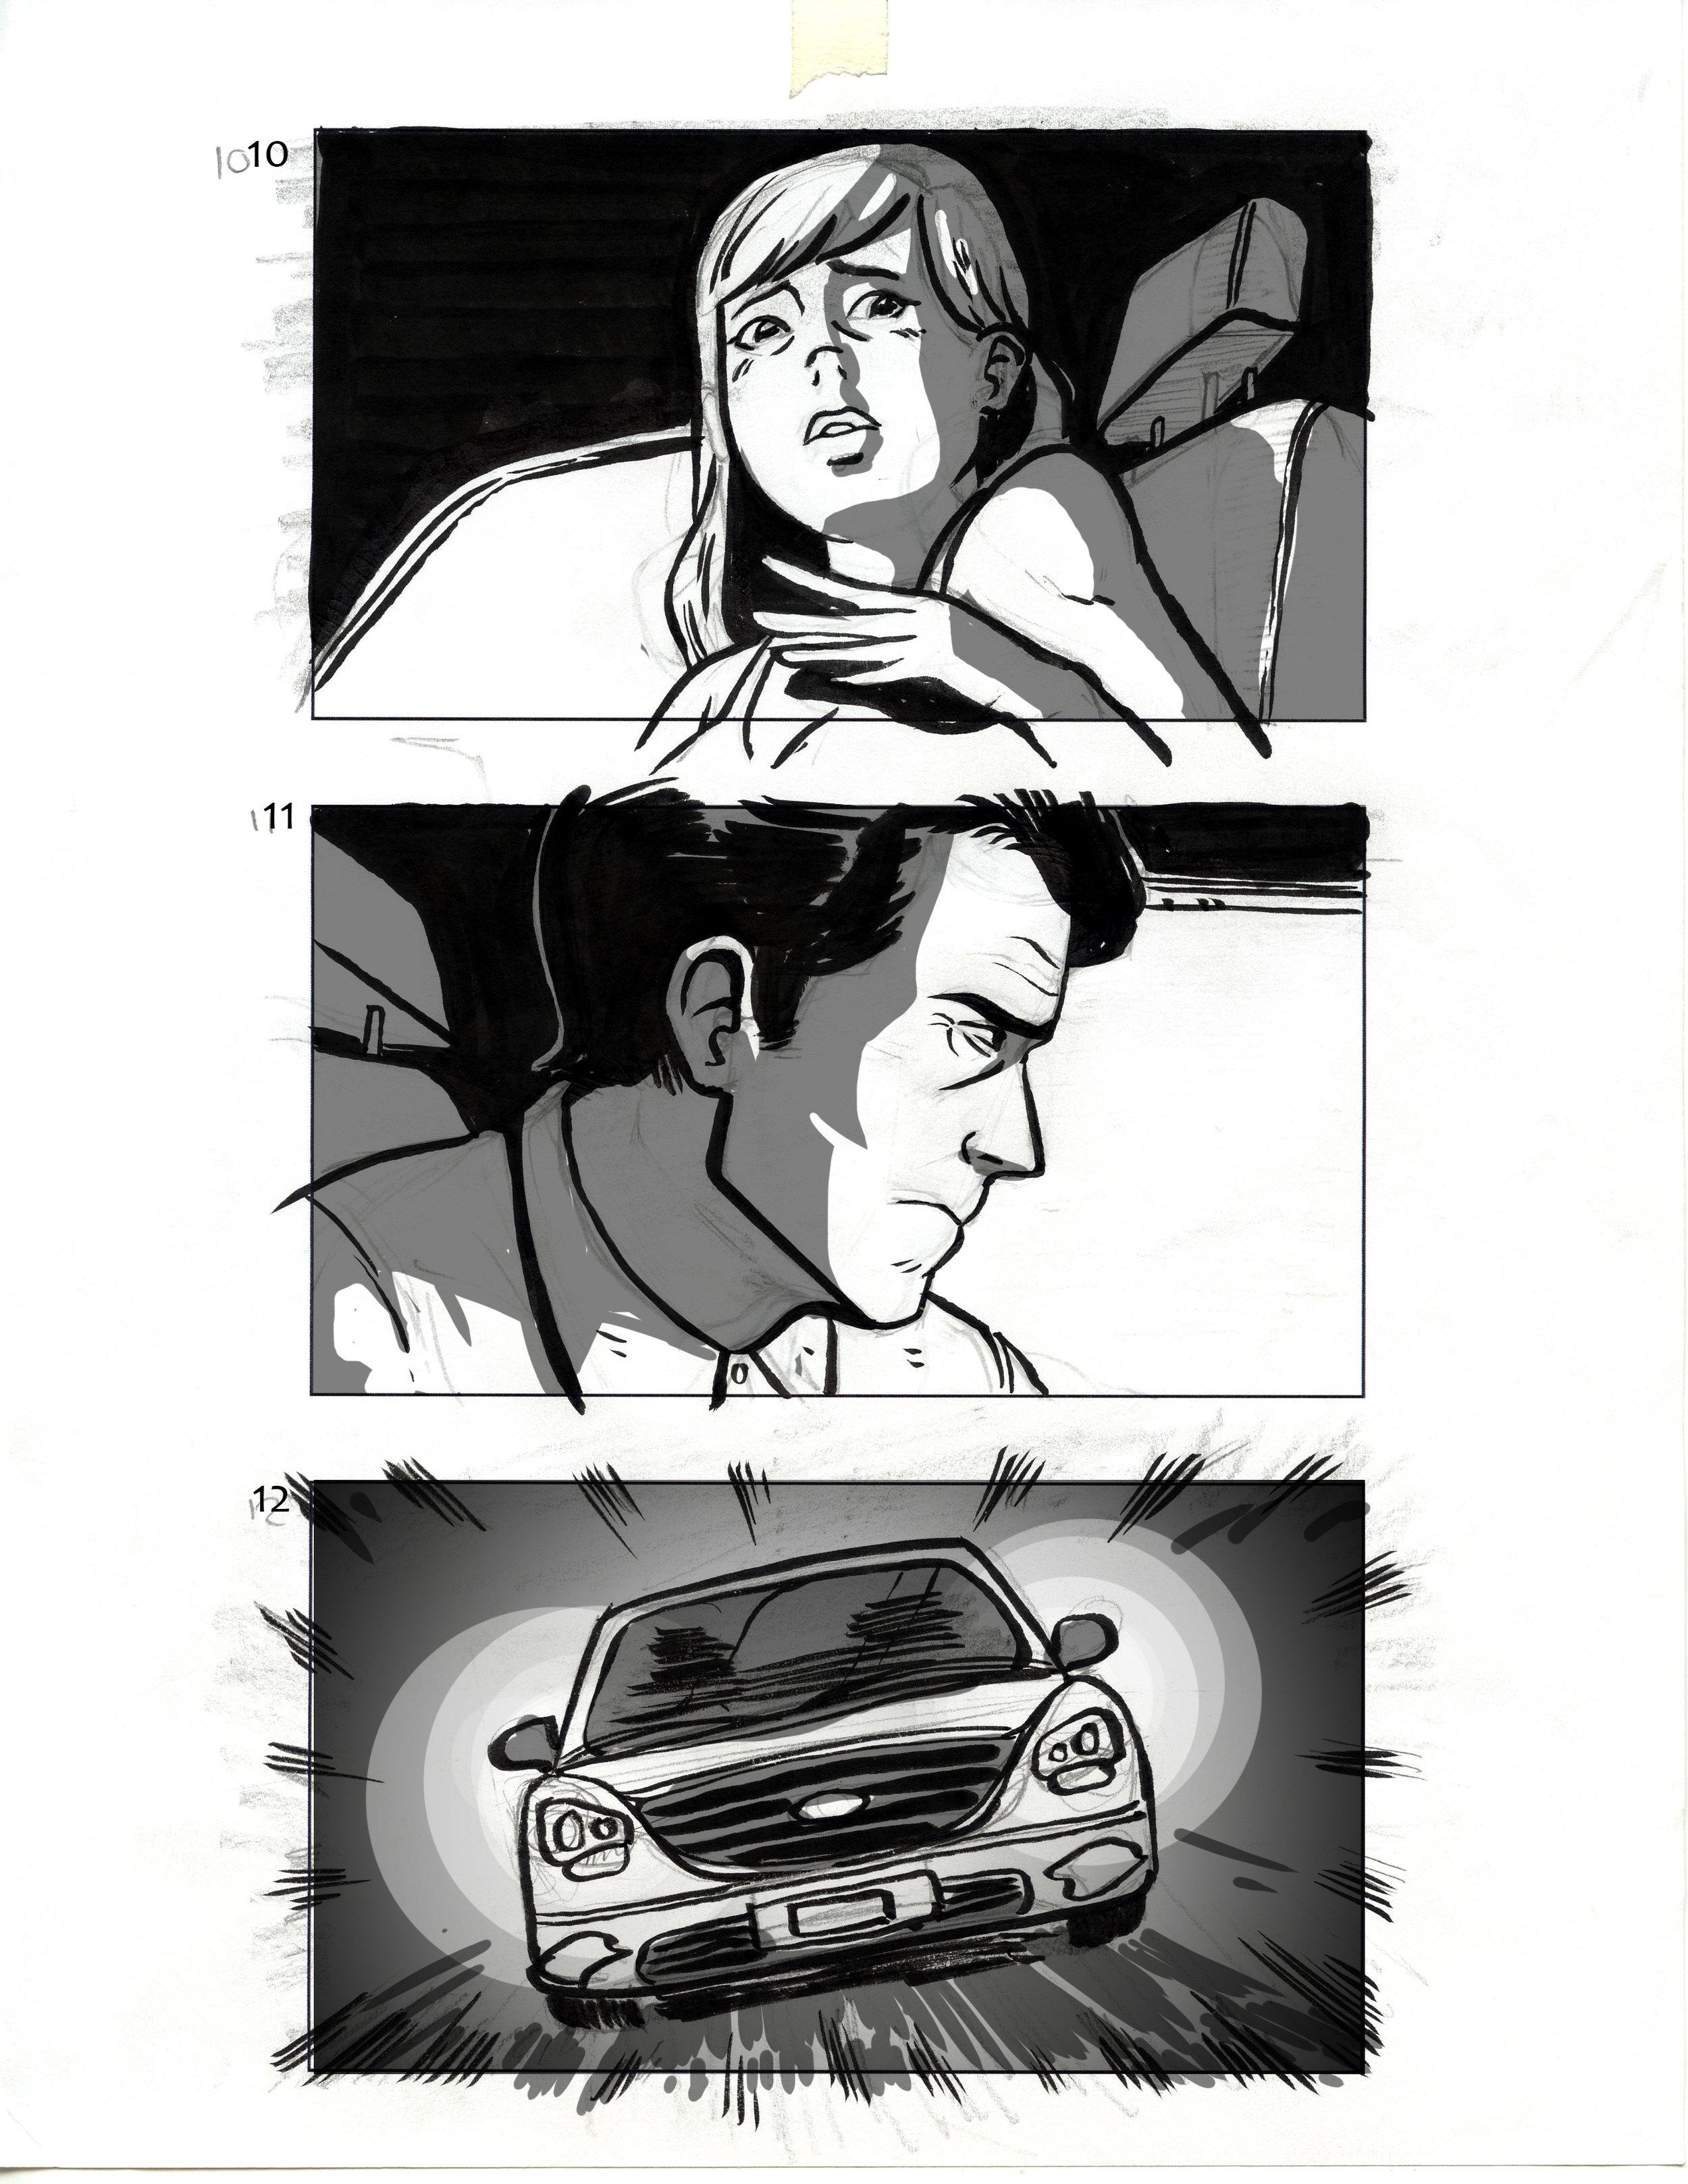 Storyboard1_10-12.jpg